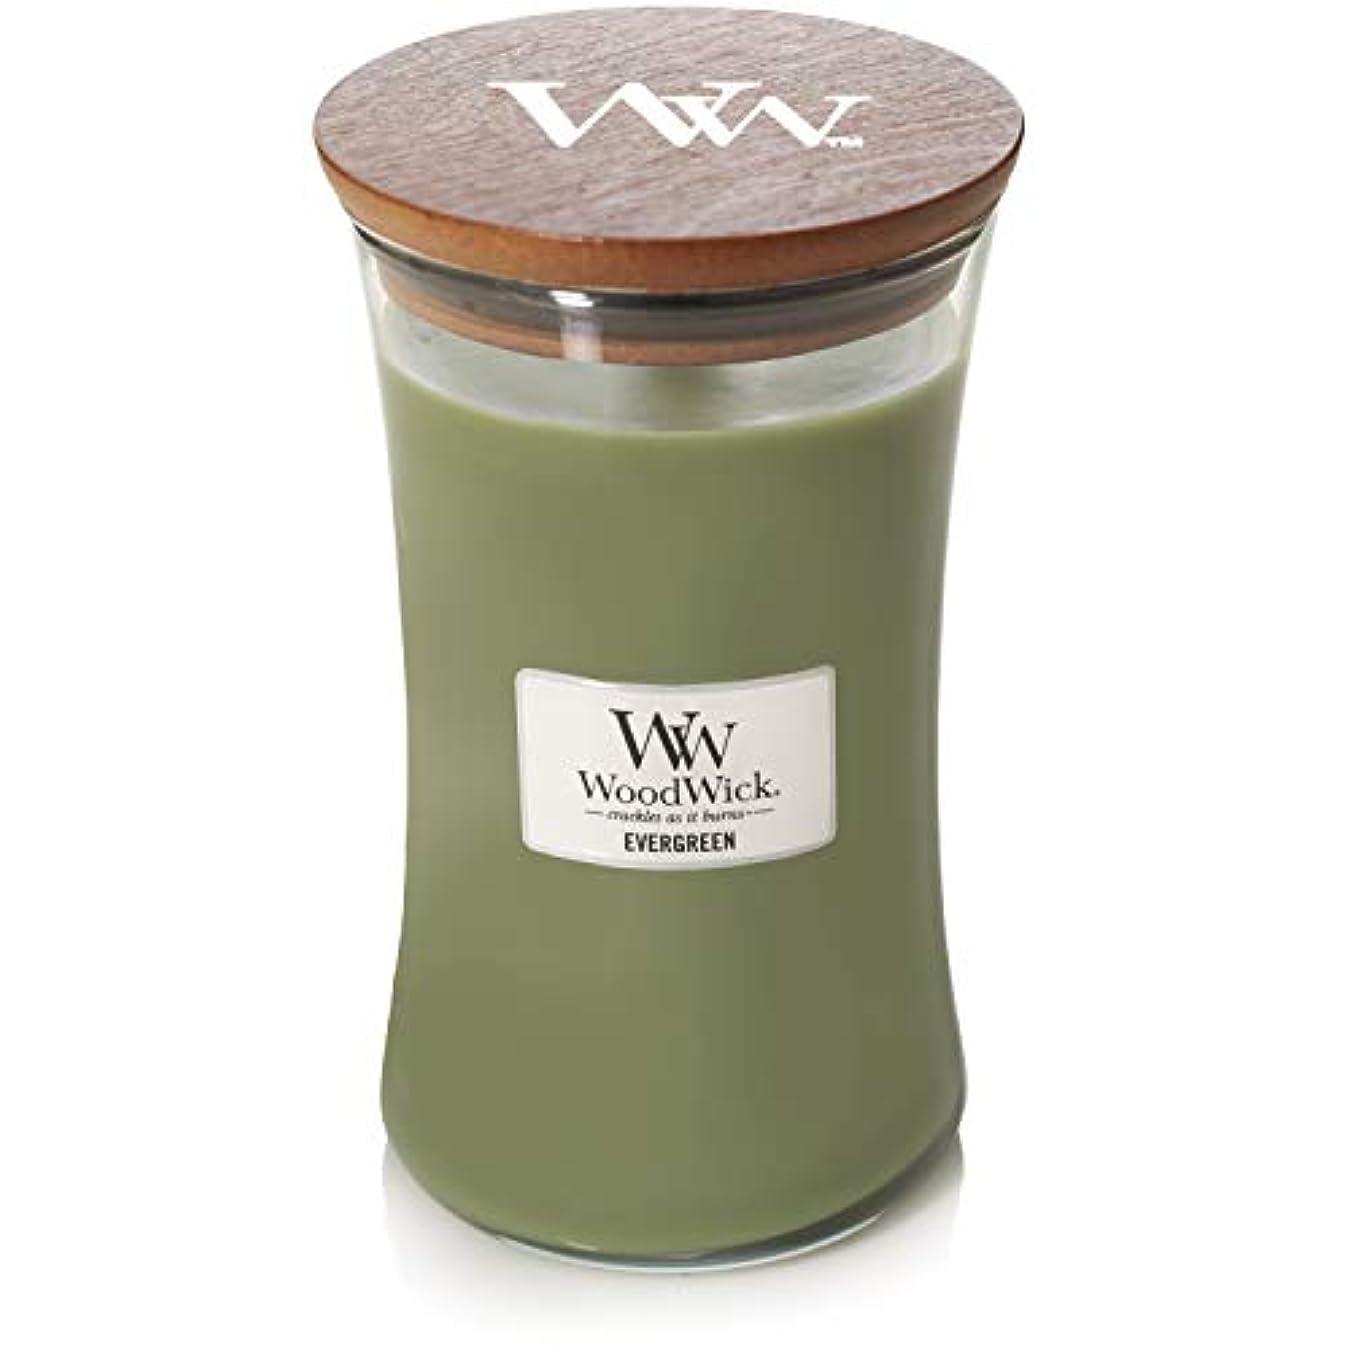 Yankee Candle Evergreen